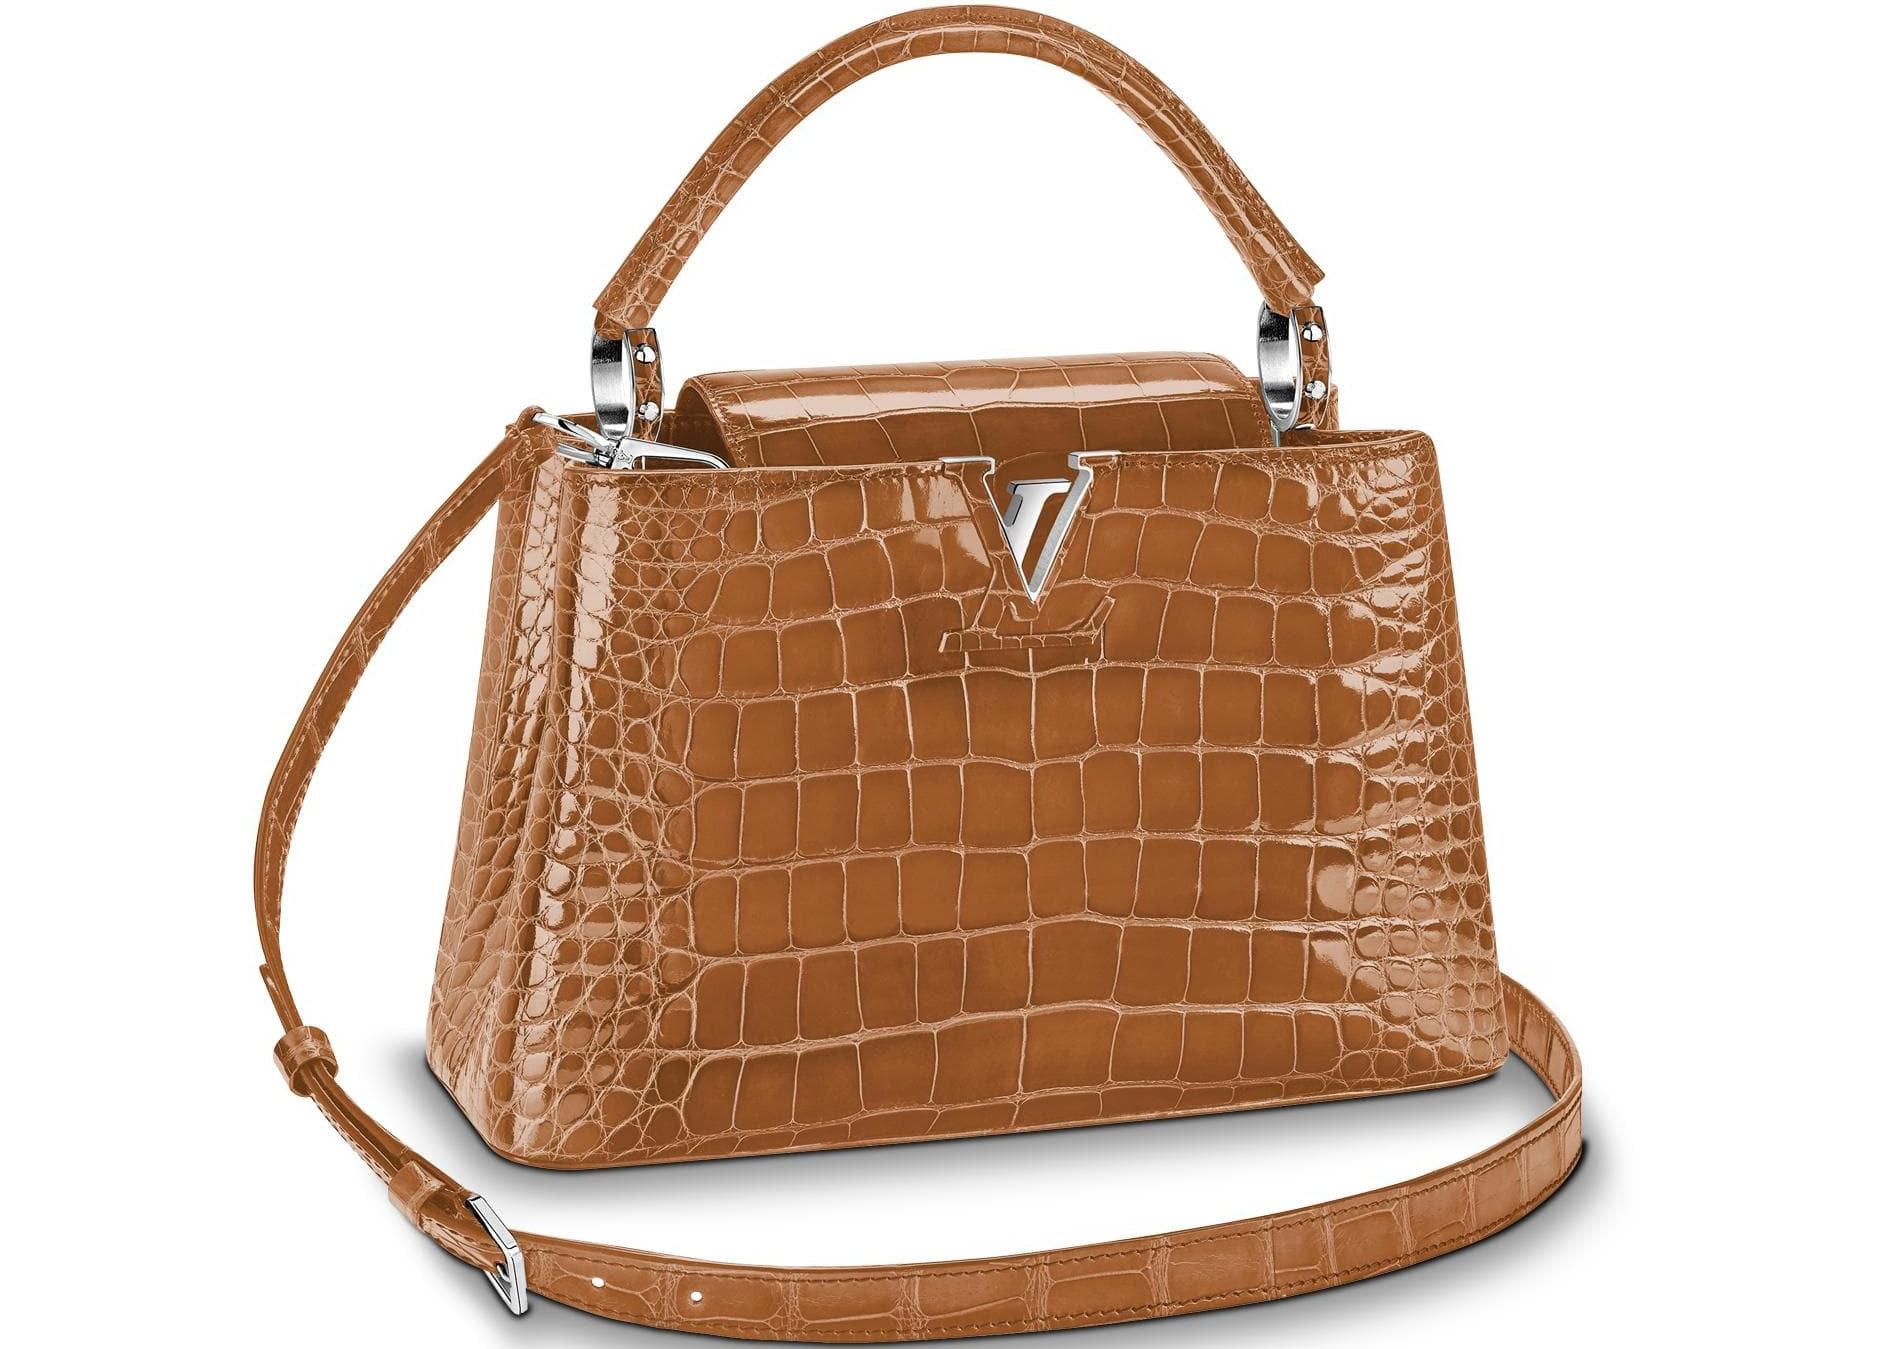 Louis Vuitton Capucines Crocodile Brillant Silver-tone PM Sienne